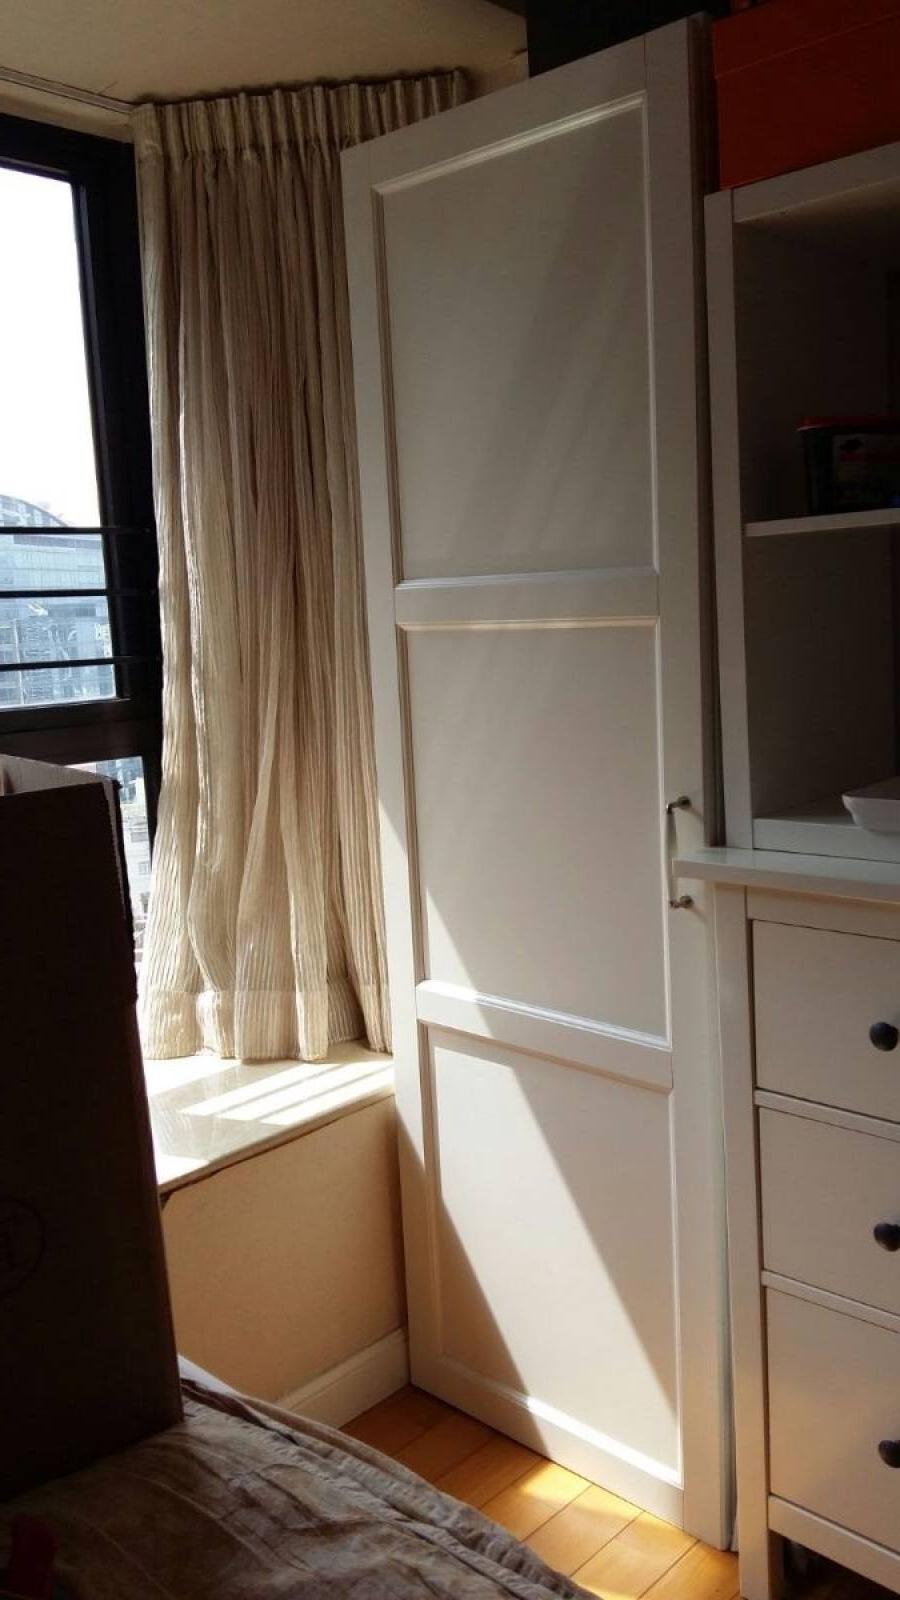 Wardrobes Cheap Regarding Recent 2 Ikea Pax Wardrobes For Cheap! – Mid Levels :: Hong Kong Geoexpat (View 10 of 15)